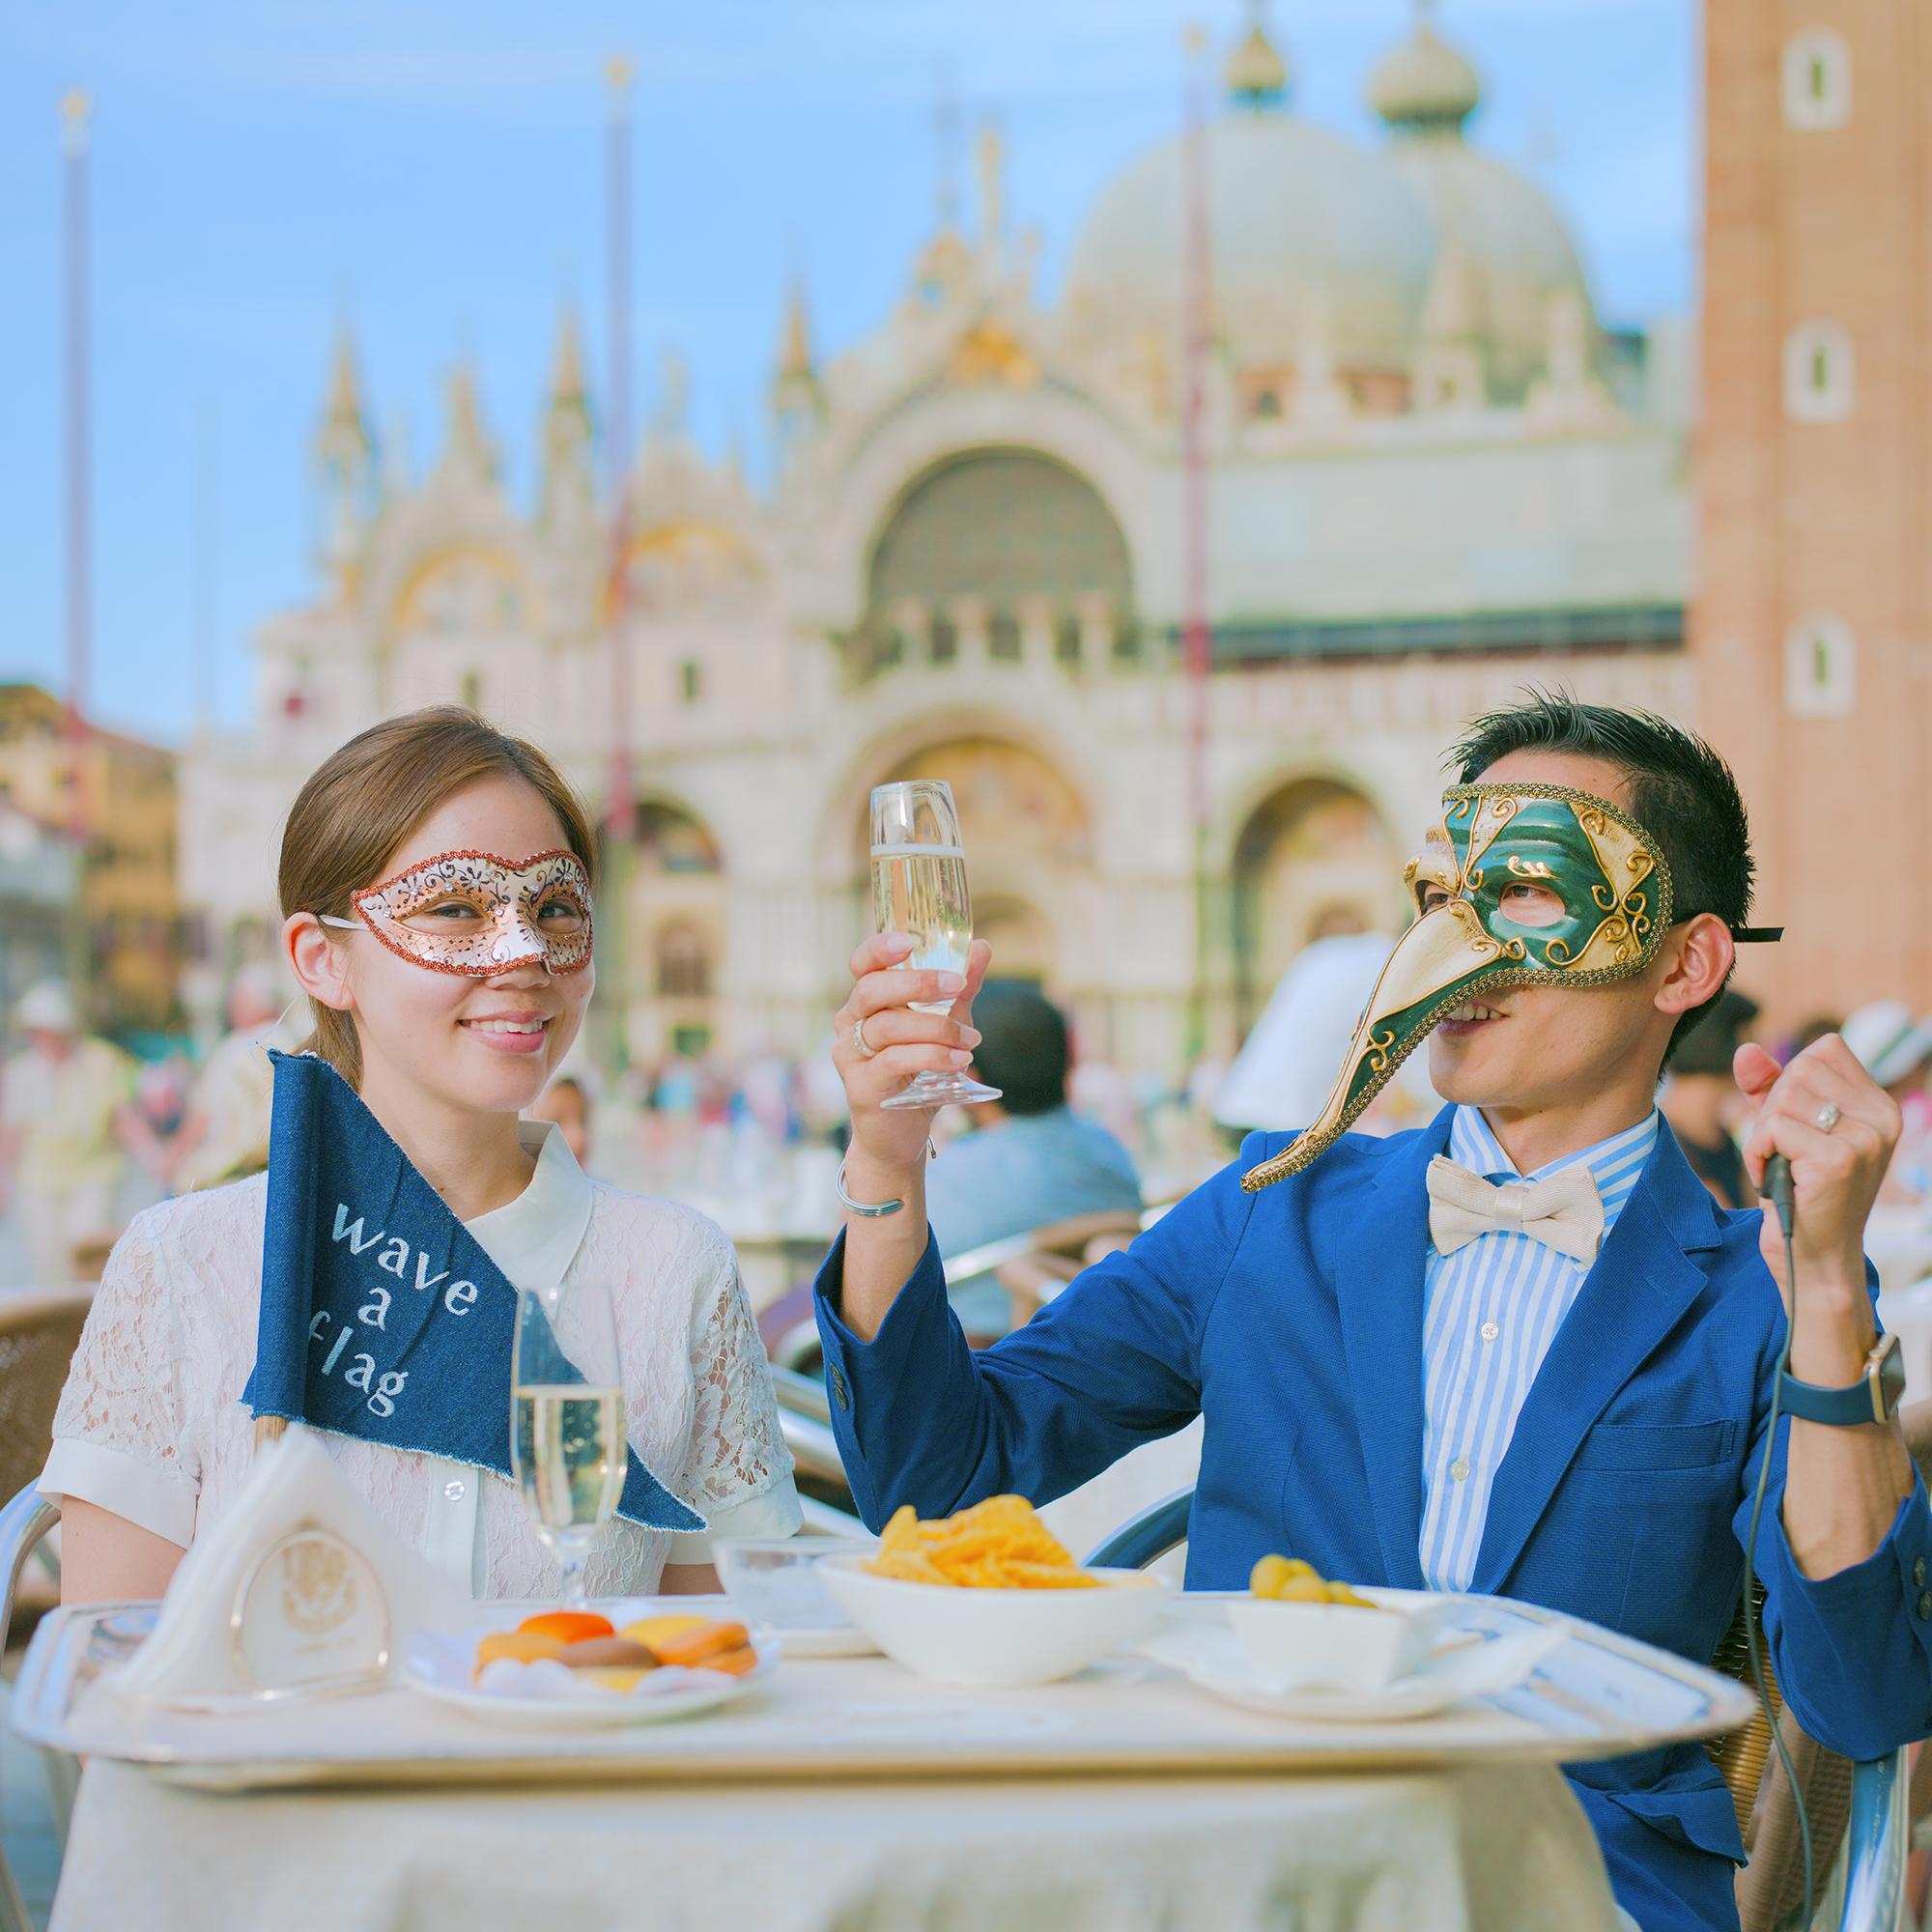 Venice, Italy / 베네치아, 이탈리아 / ヴェネツィア, イタリア